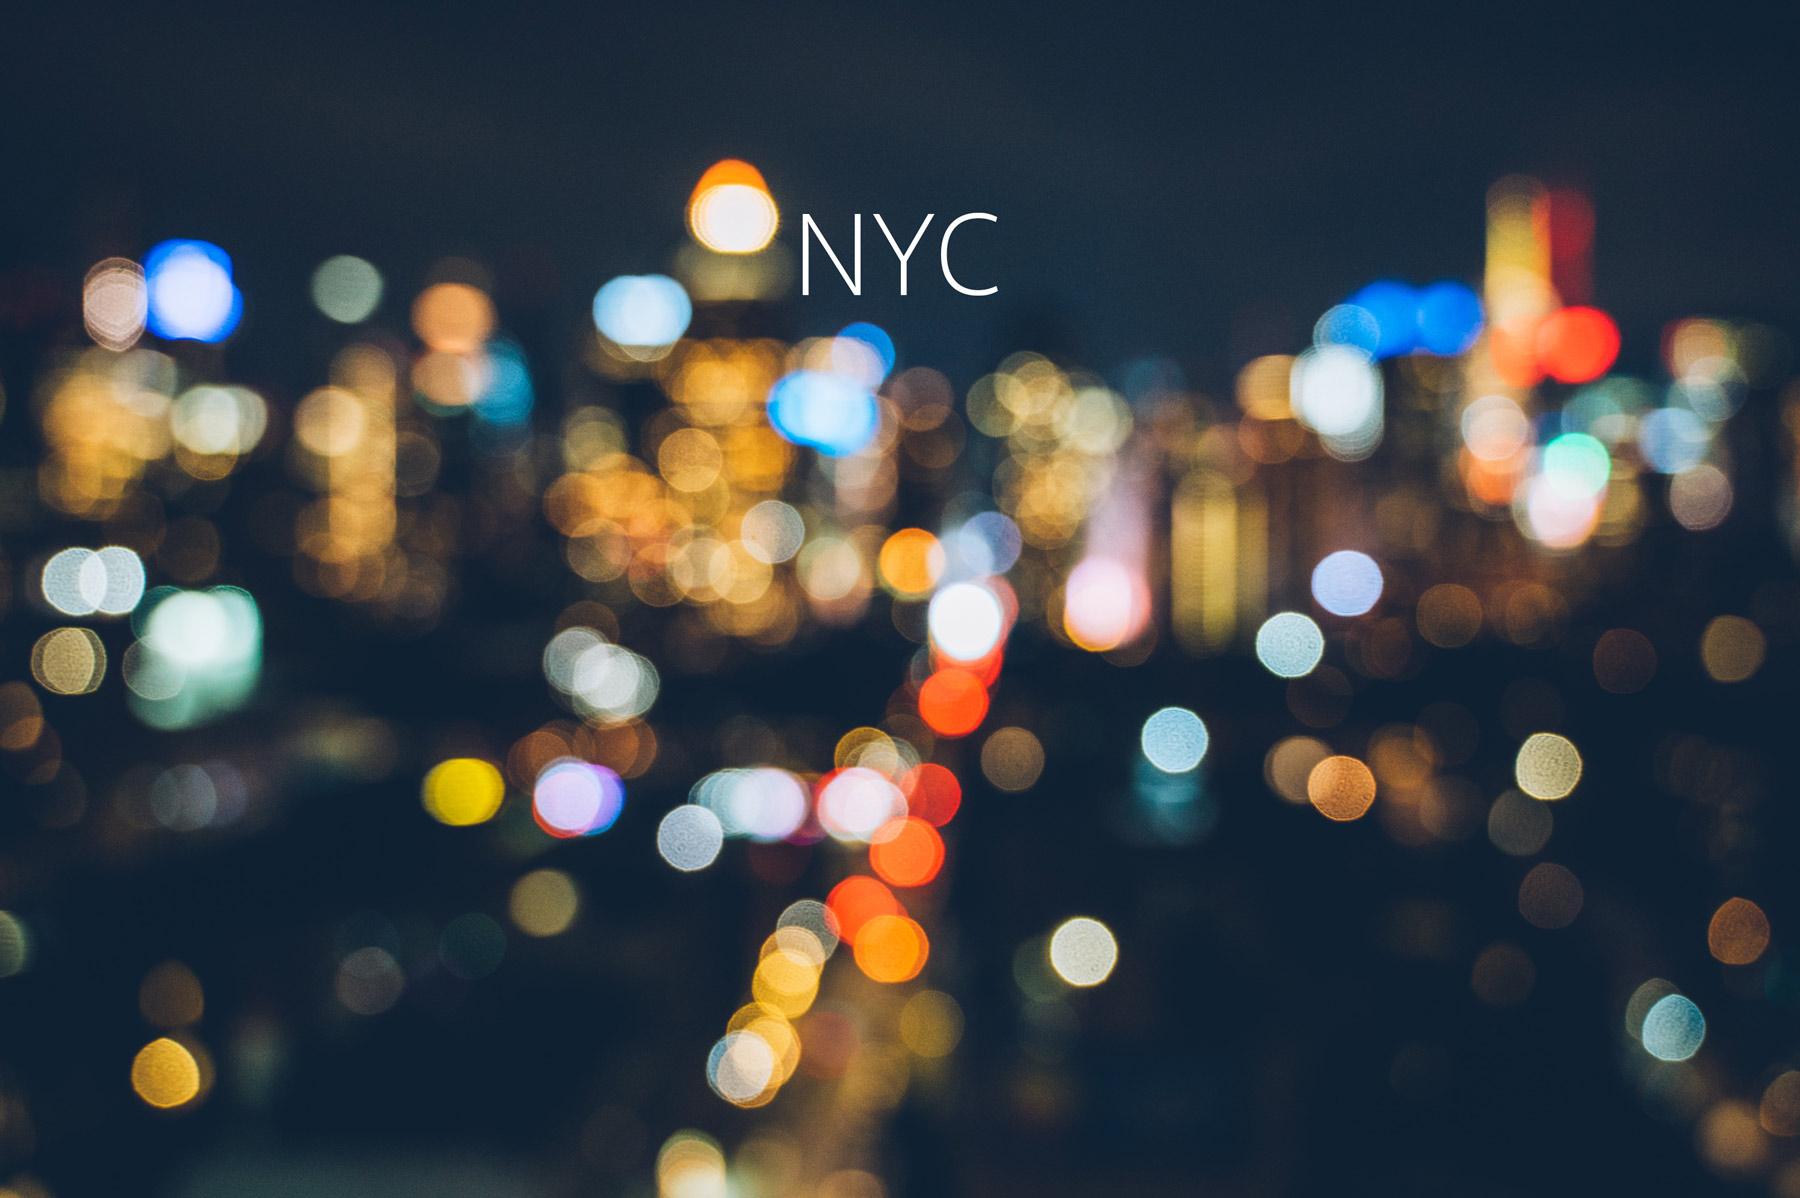 Les meilleurs rooftops de New York